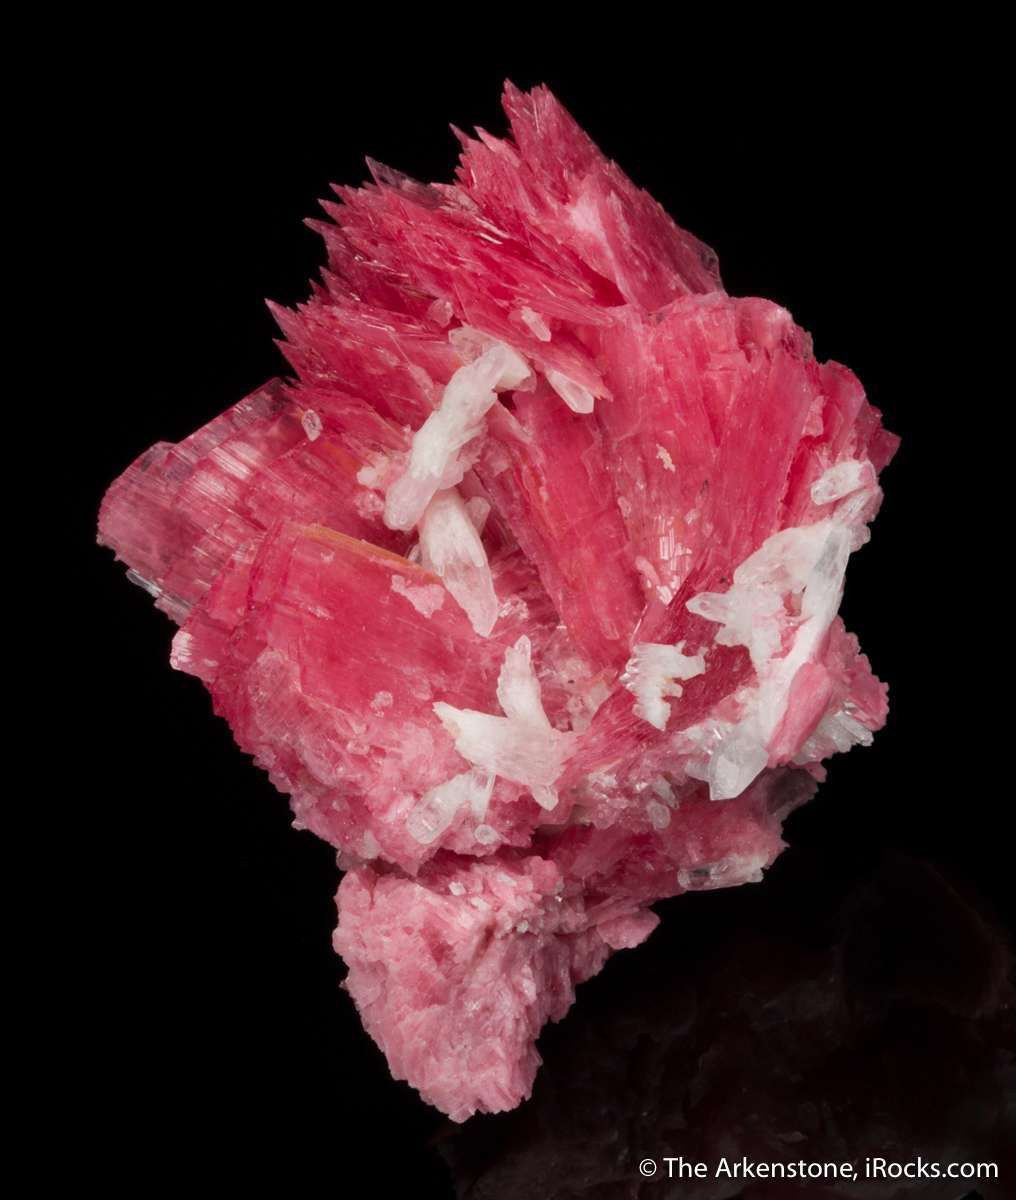 Rock and Minerals Love Healing Crystals Reiki Rocks Palm Stones Rhodonite Quartz Crystal Tumble Stone Mineral Specimen